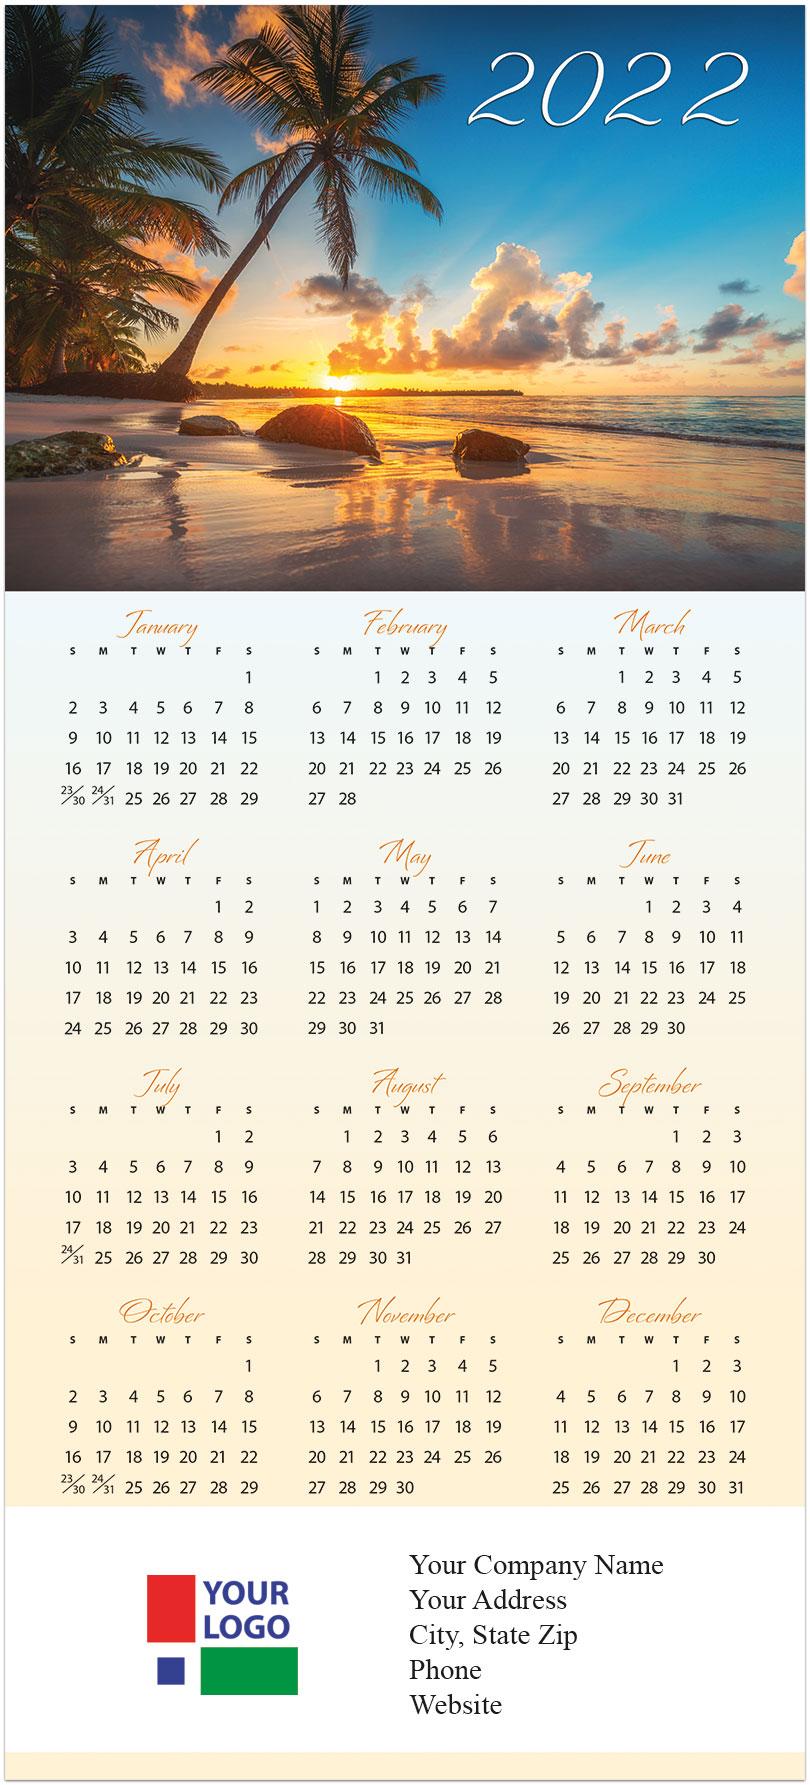 Sunset Calendar 2022.Tropical Sunset Calendar Card 2022 Calendars Posty Cards